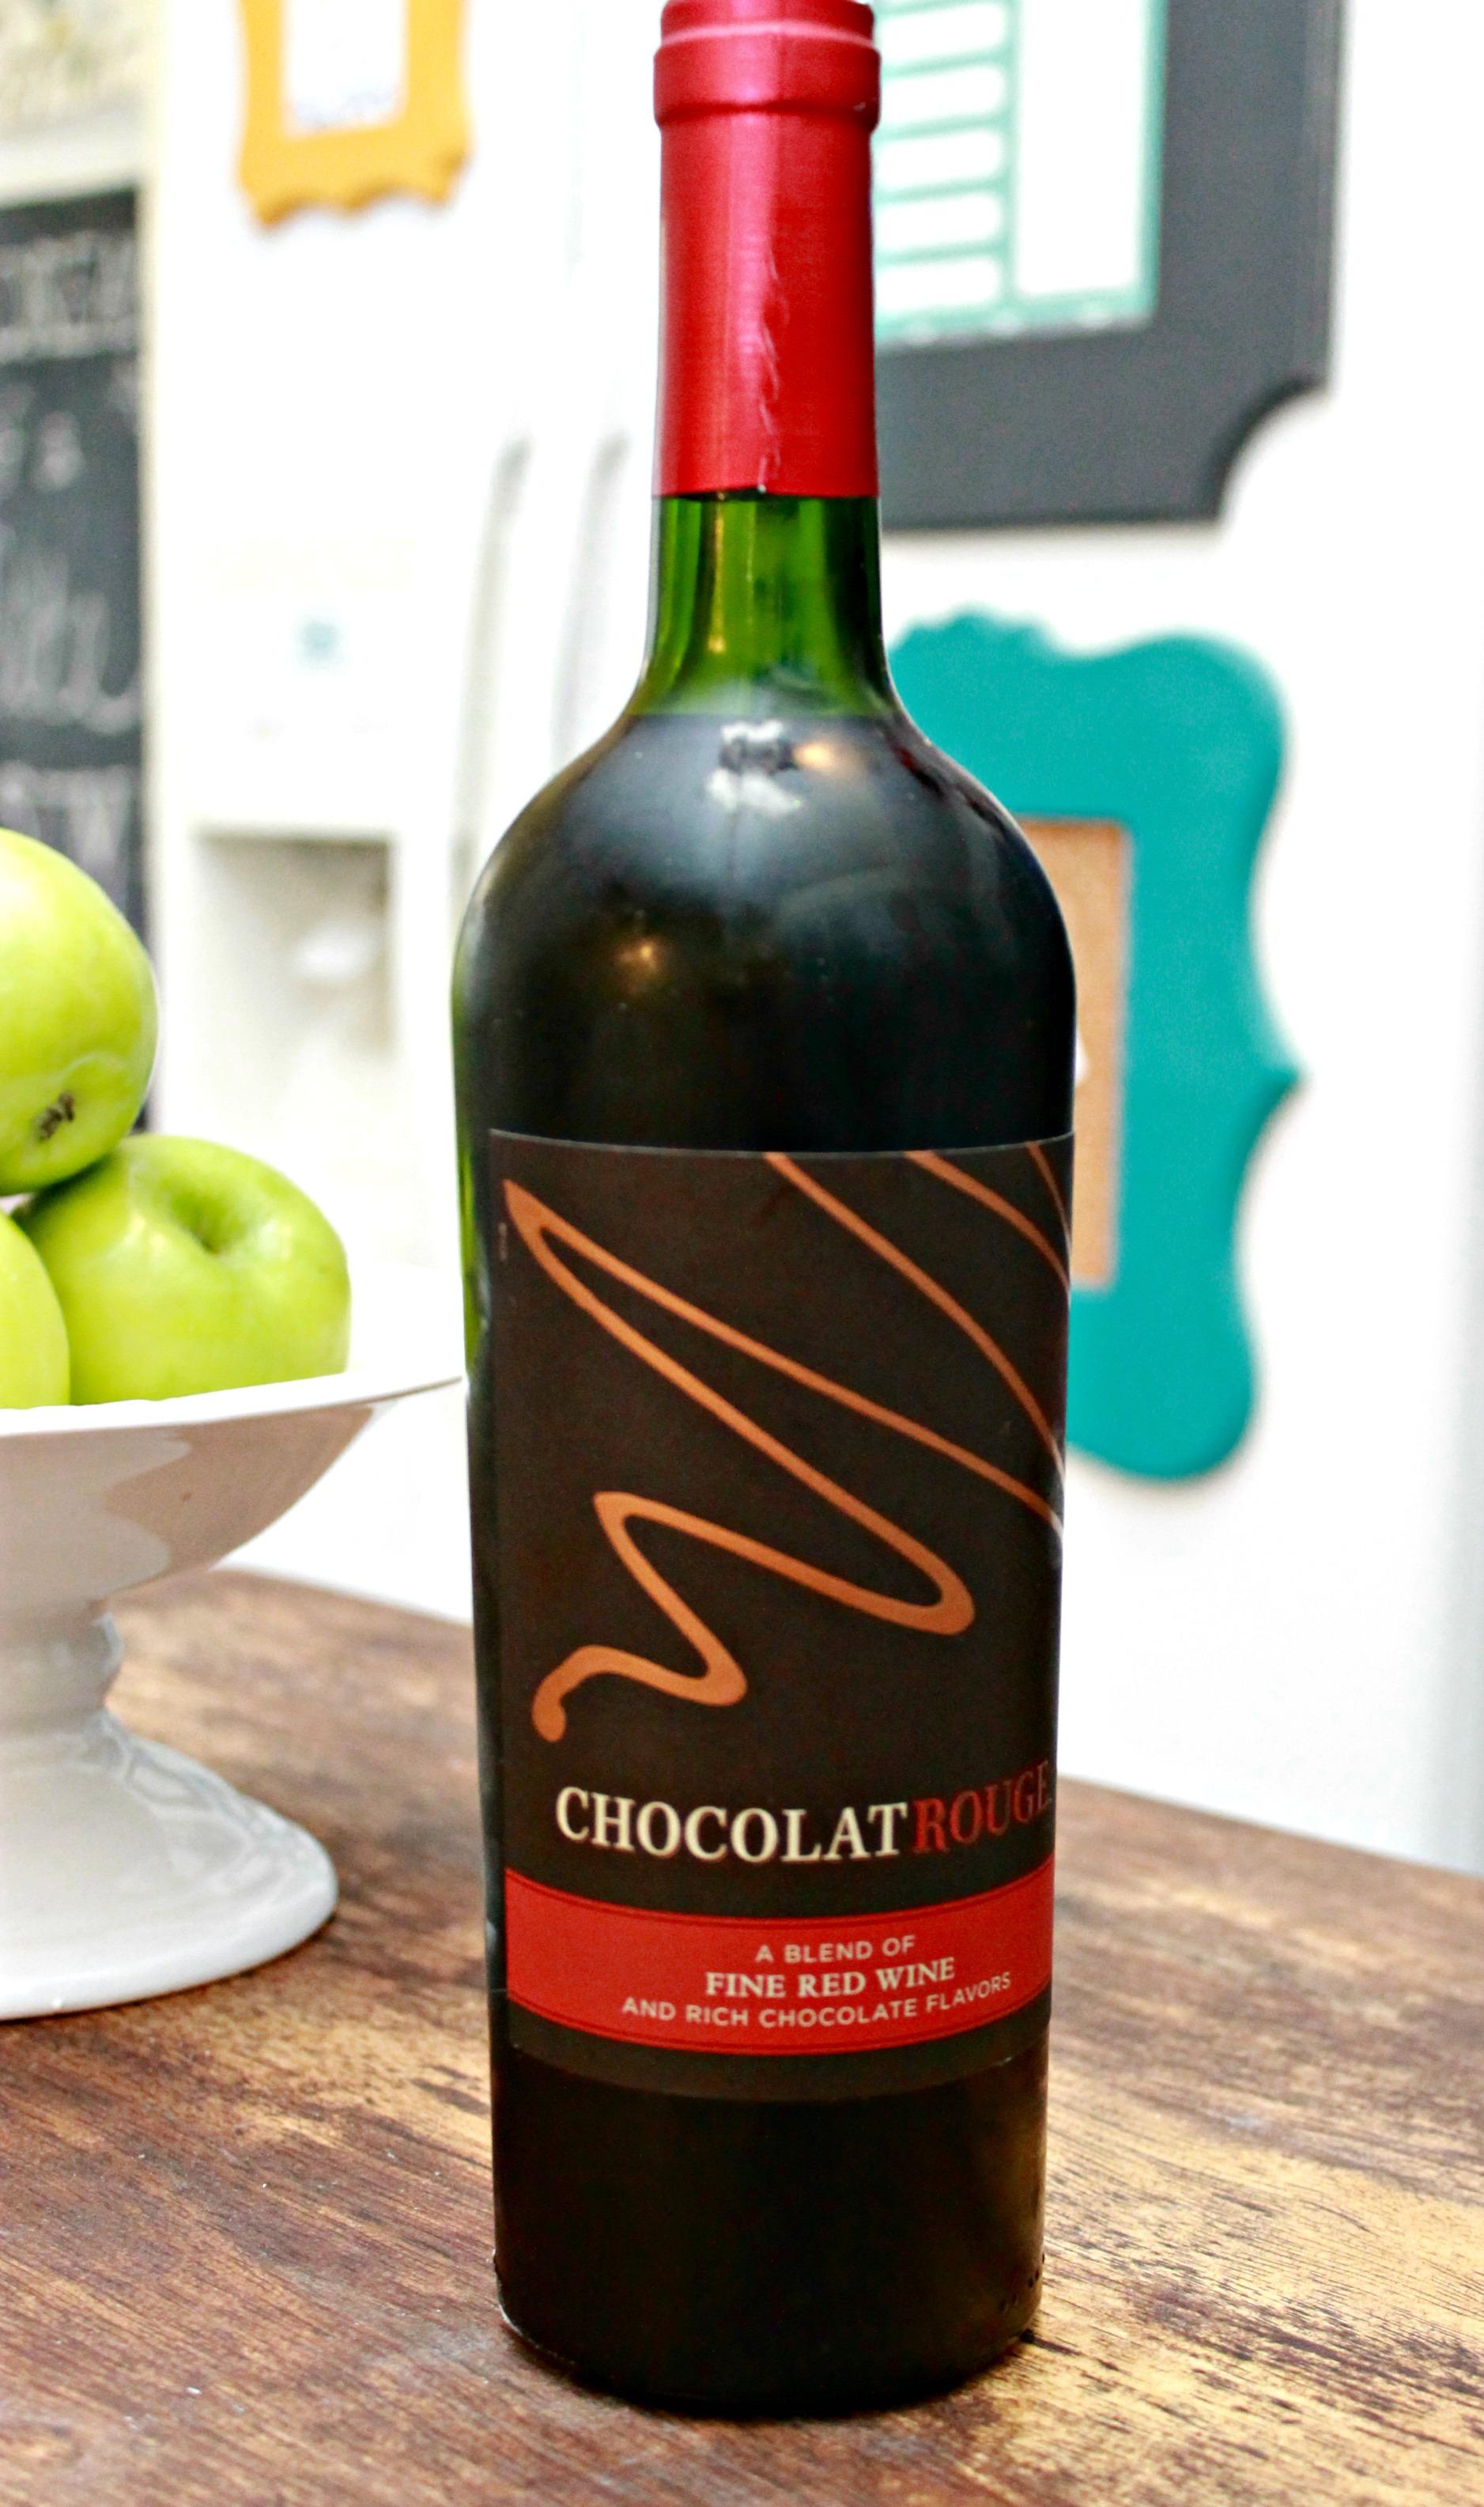 DIY Burlap Wine Gift Bag and Chocolate Wine - Mom 4 Real